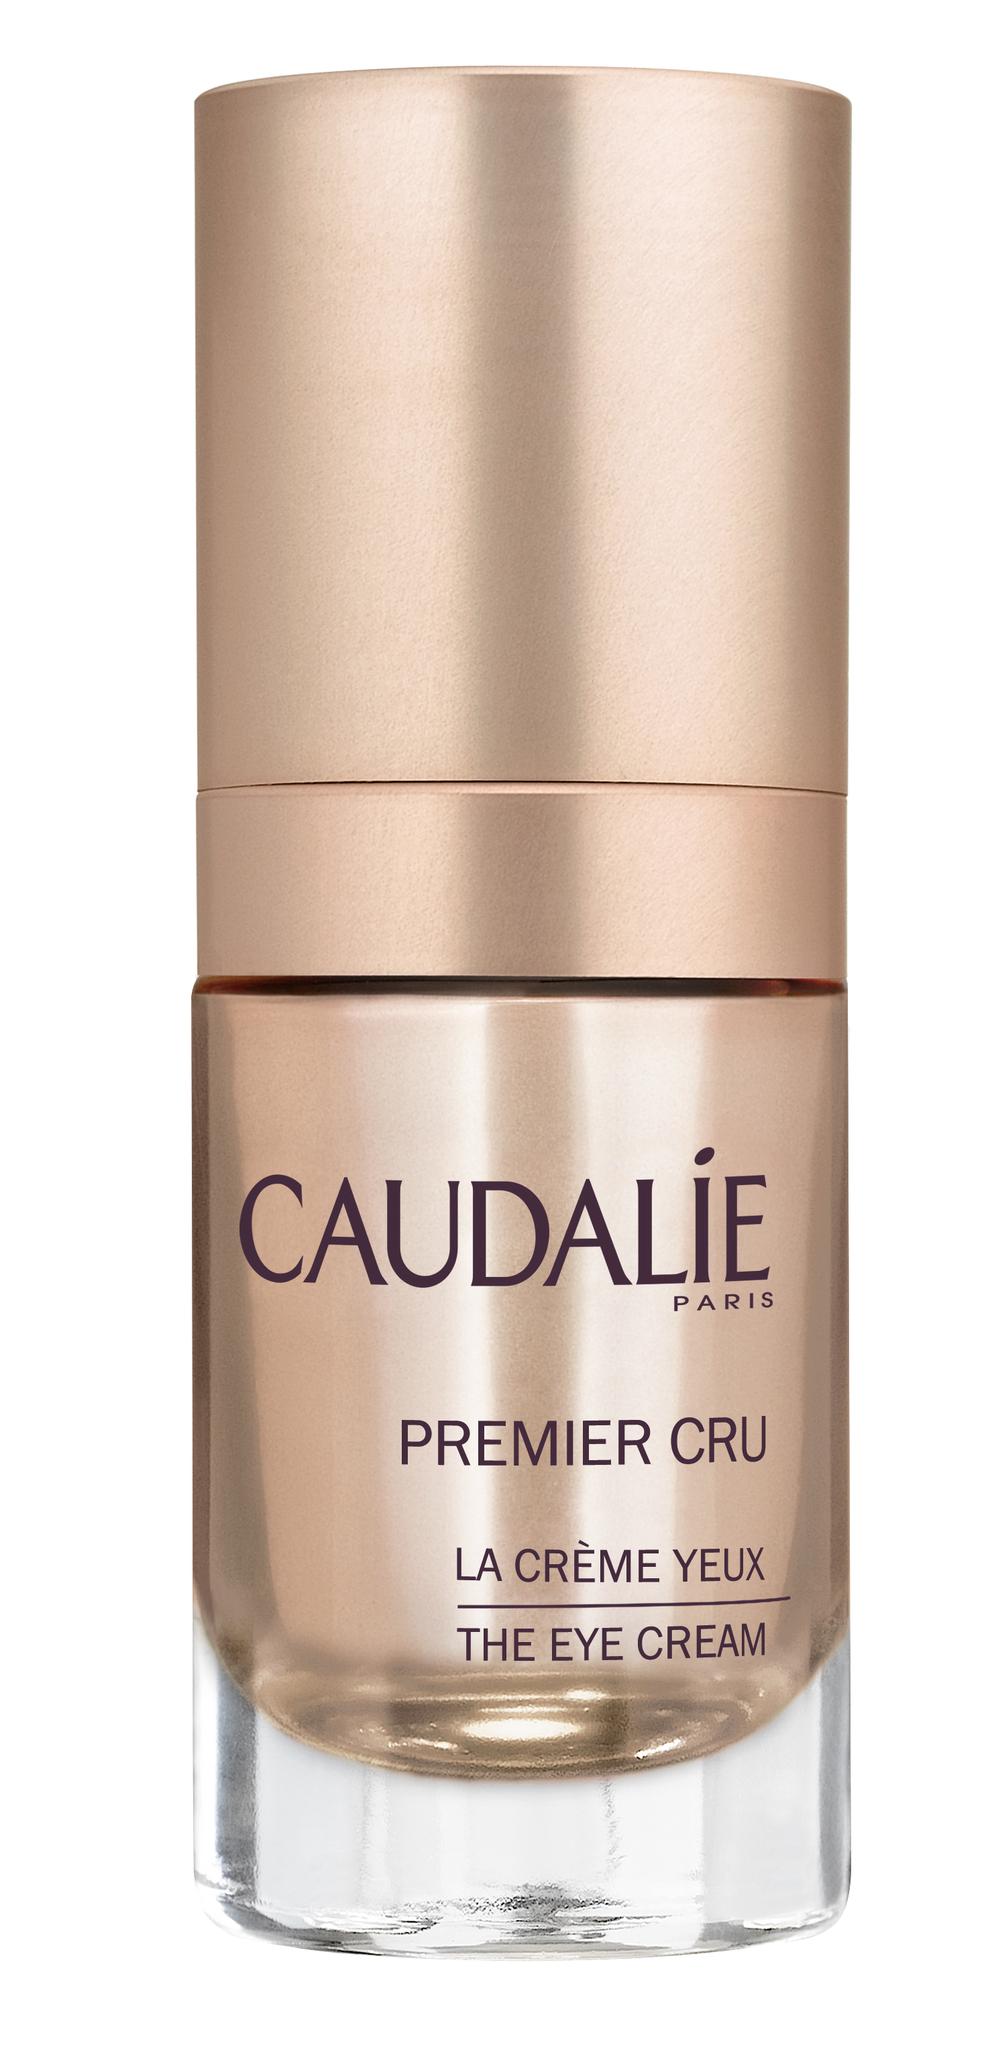 Caudalie Premier CRU Eye Cream 15 Ml